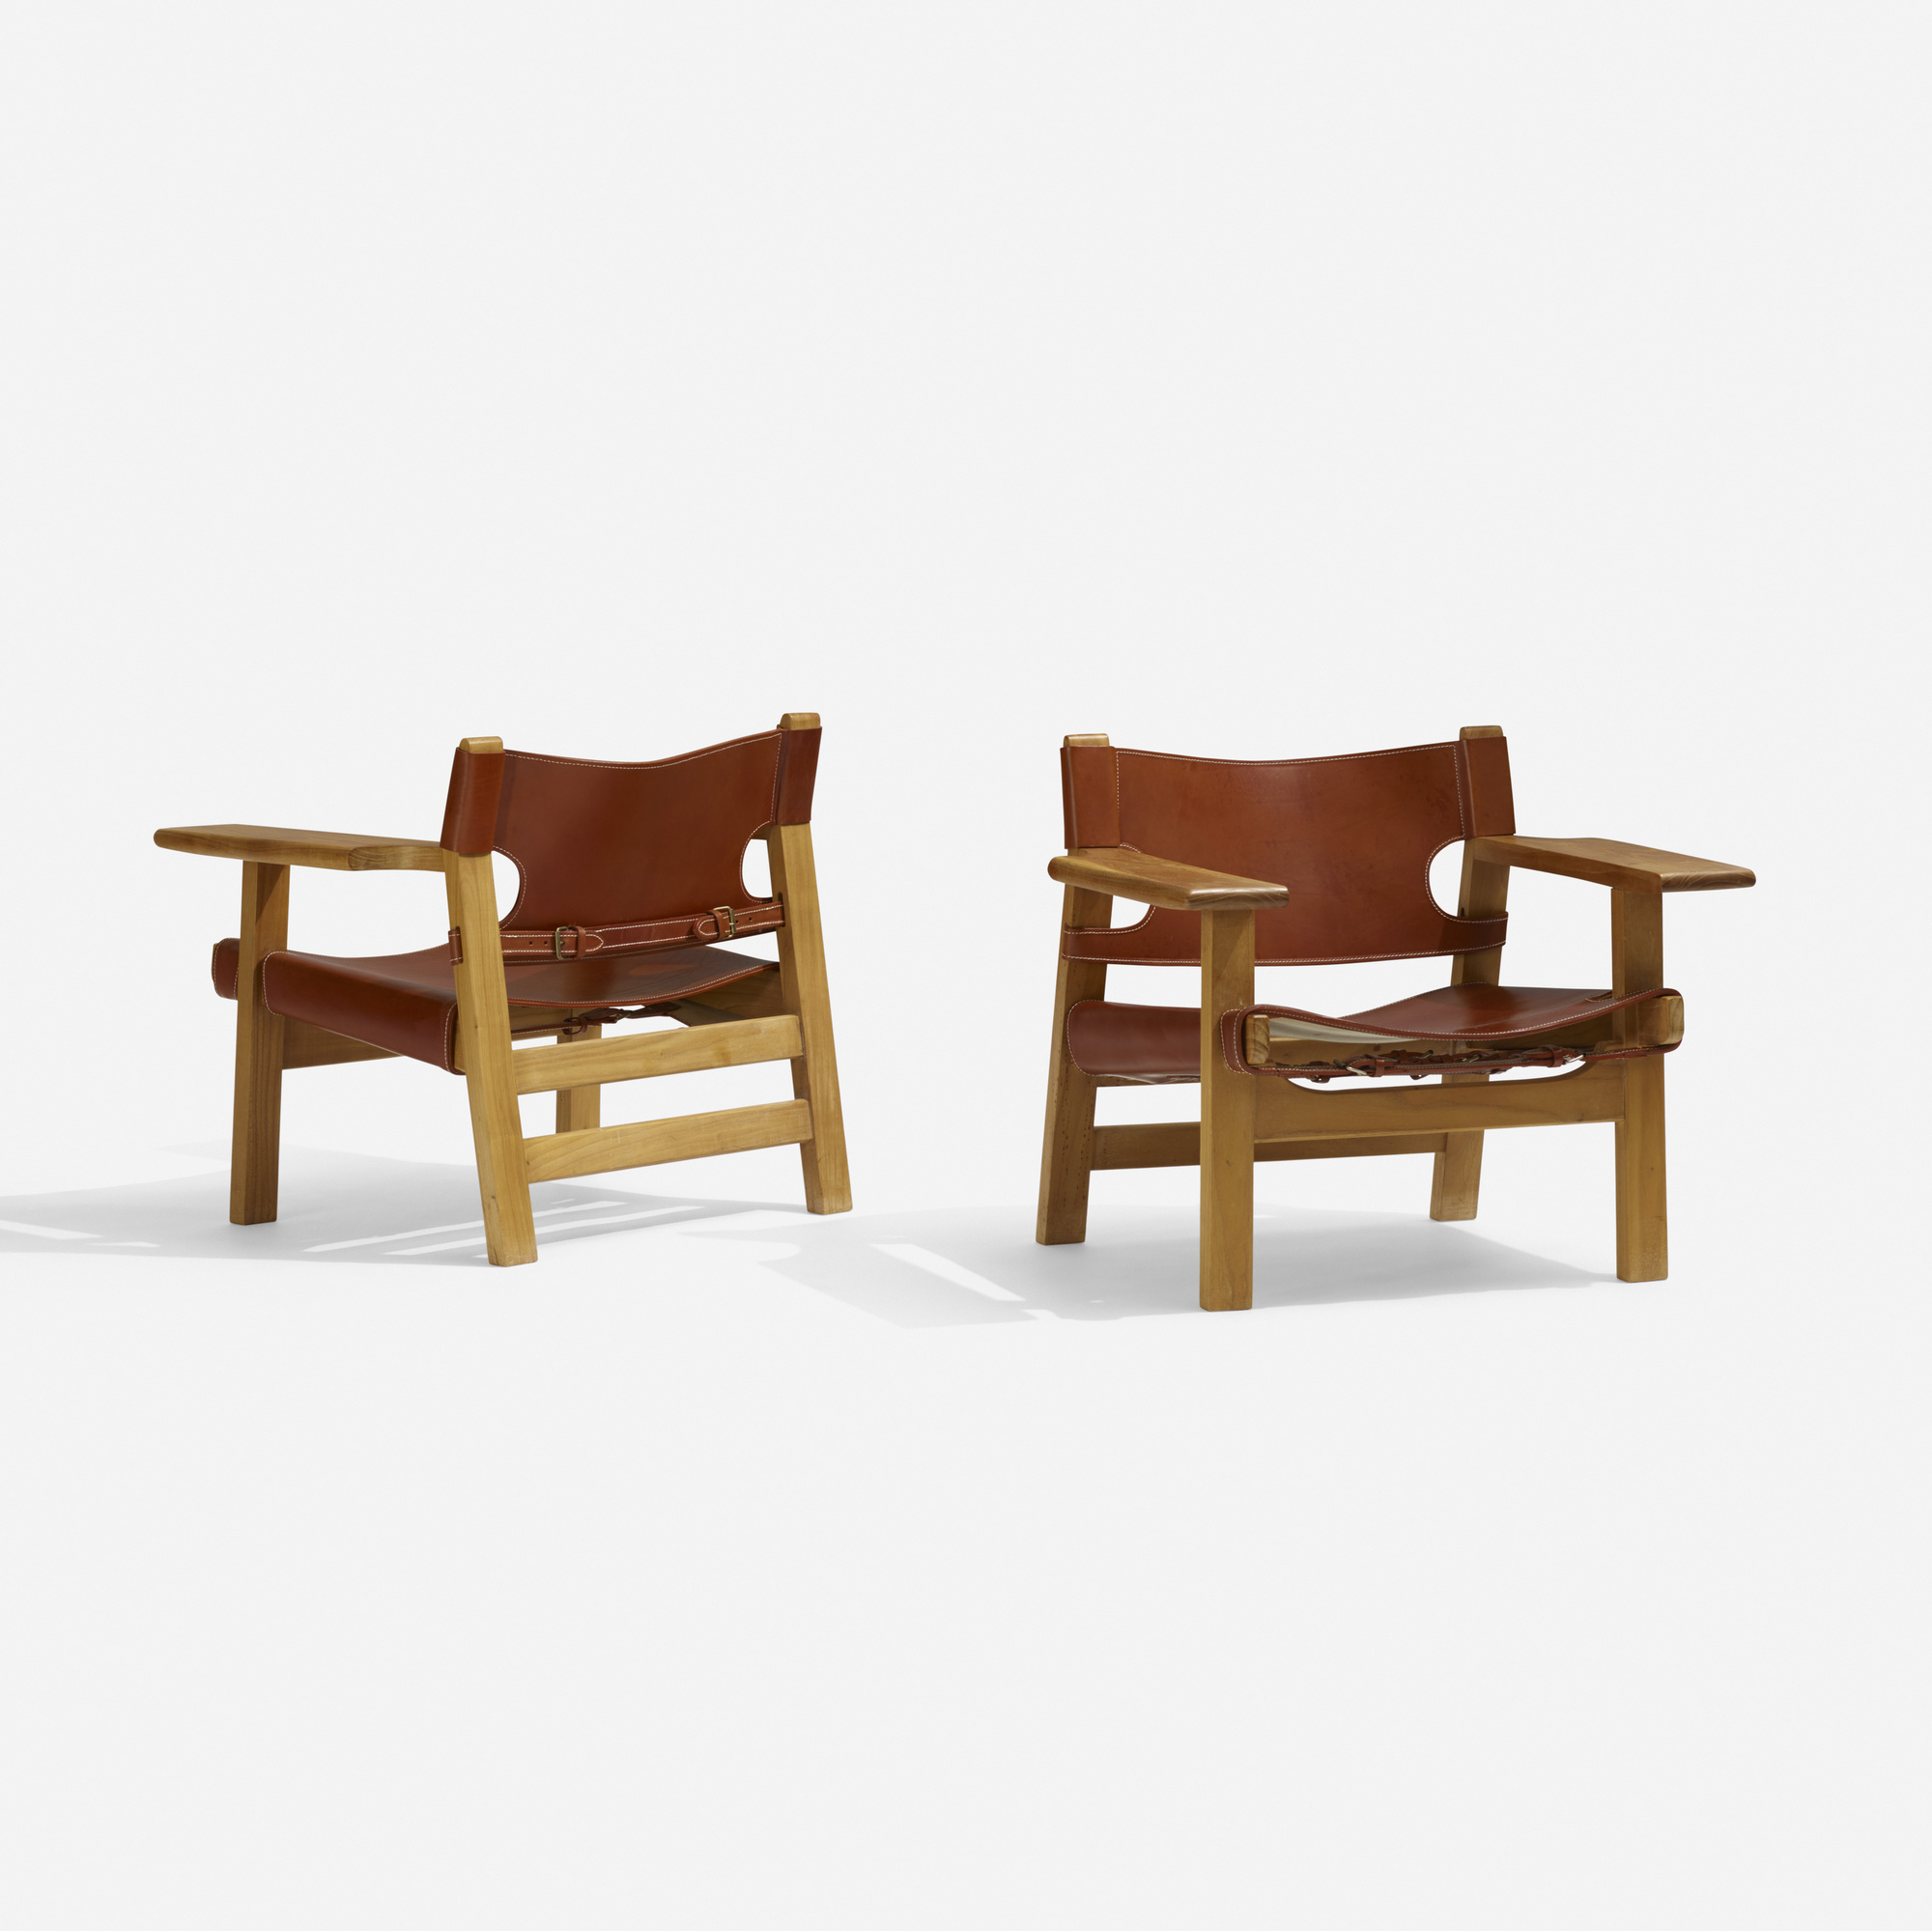 327: Børge Mogensen / Spanish chairs, pair (1 of 3)